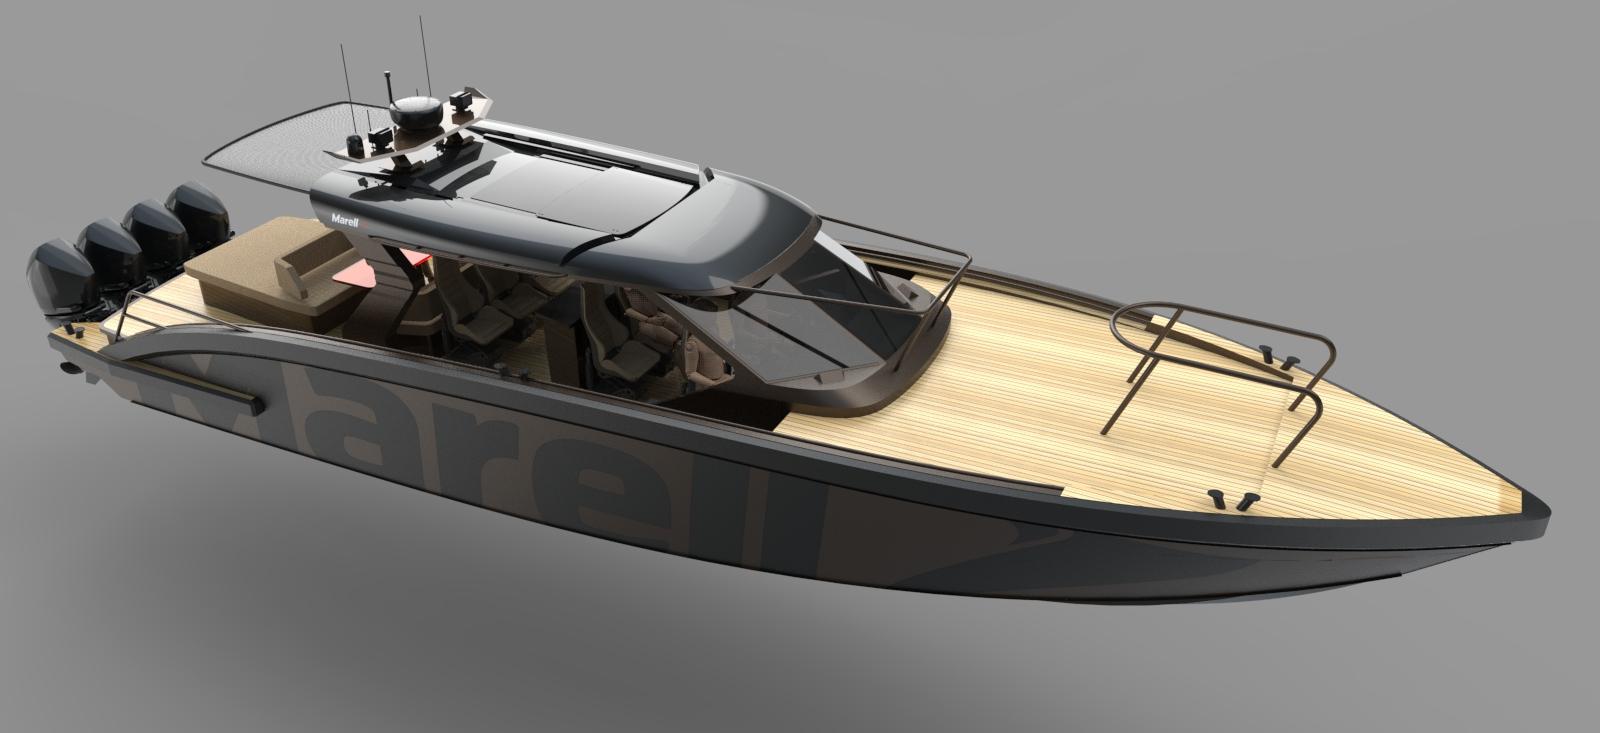 M15 tender rendered boat model